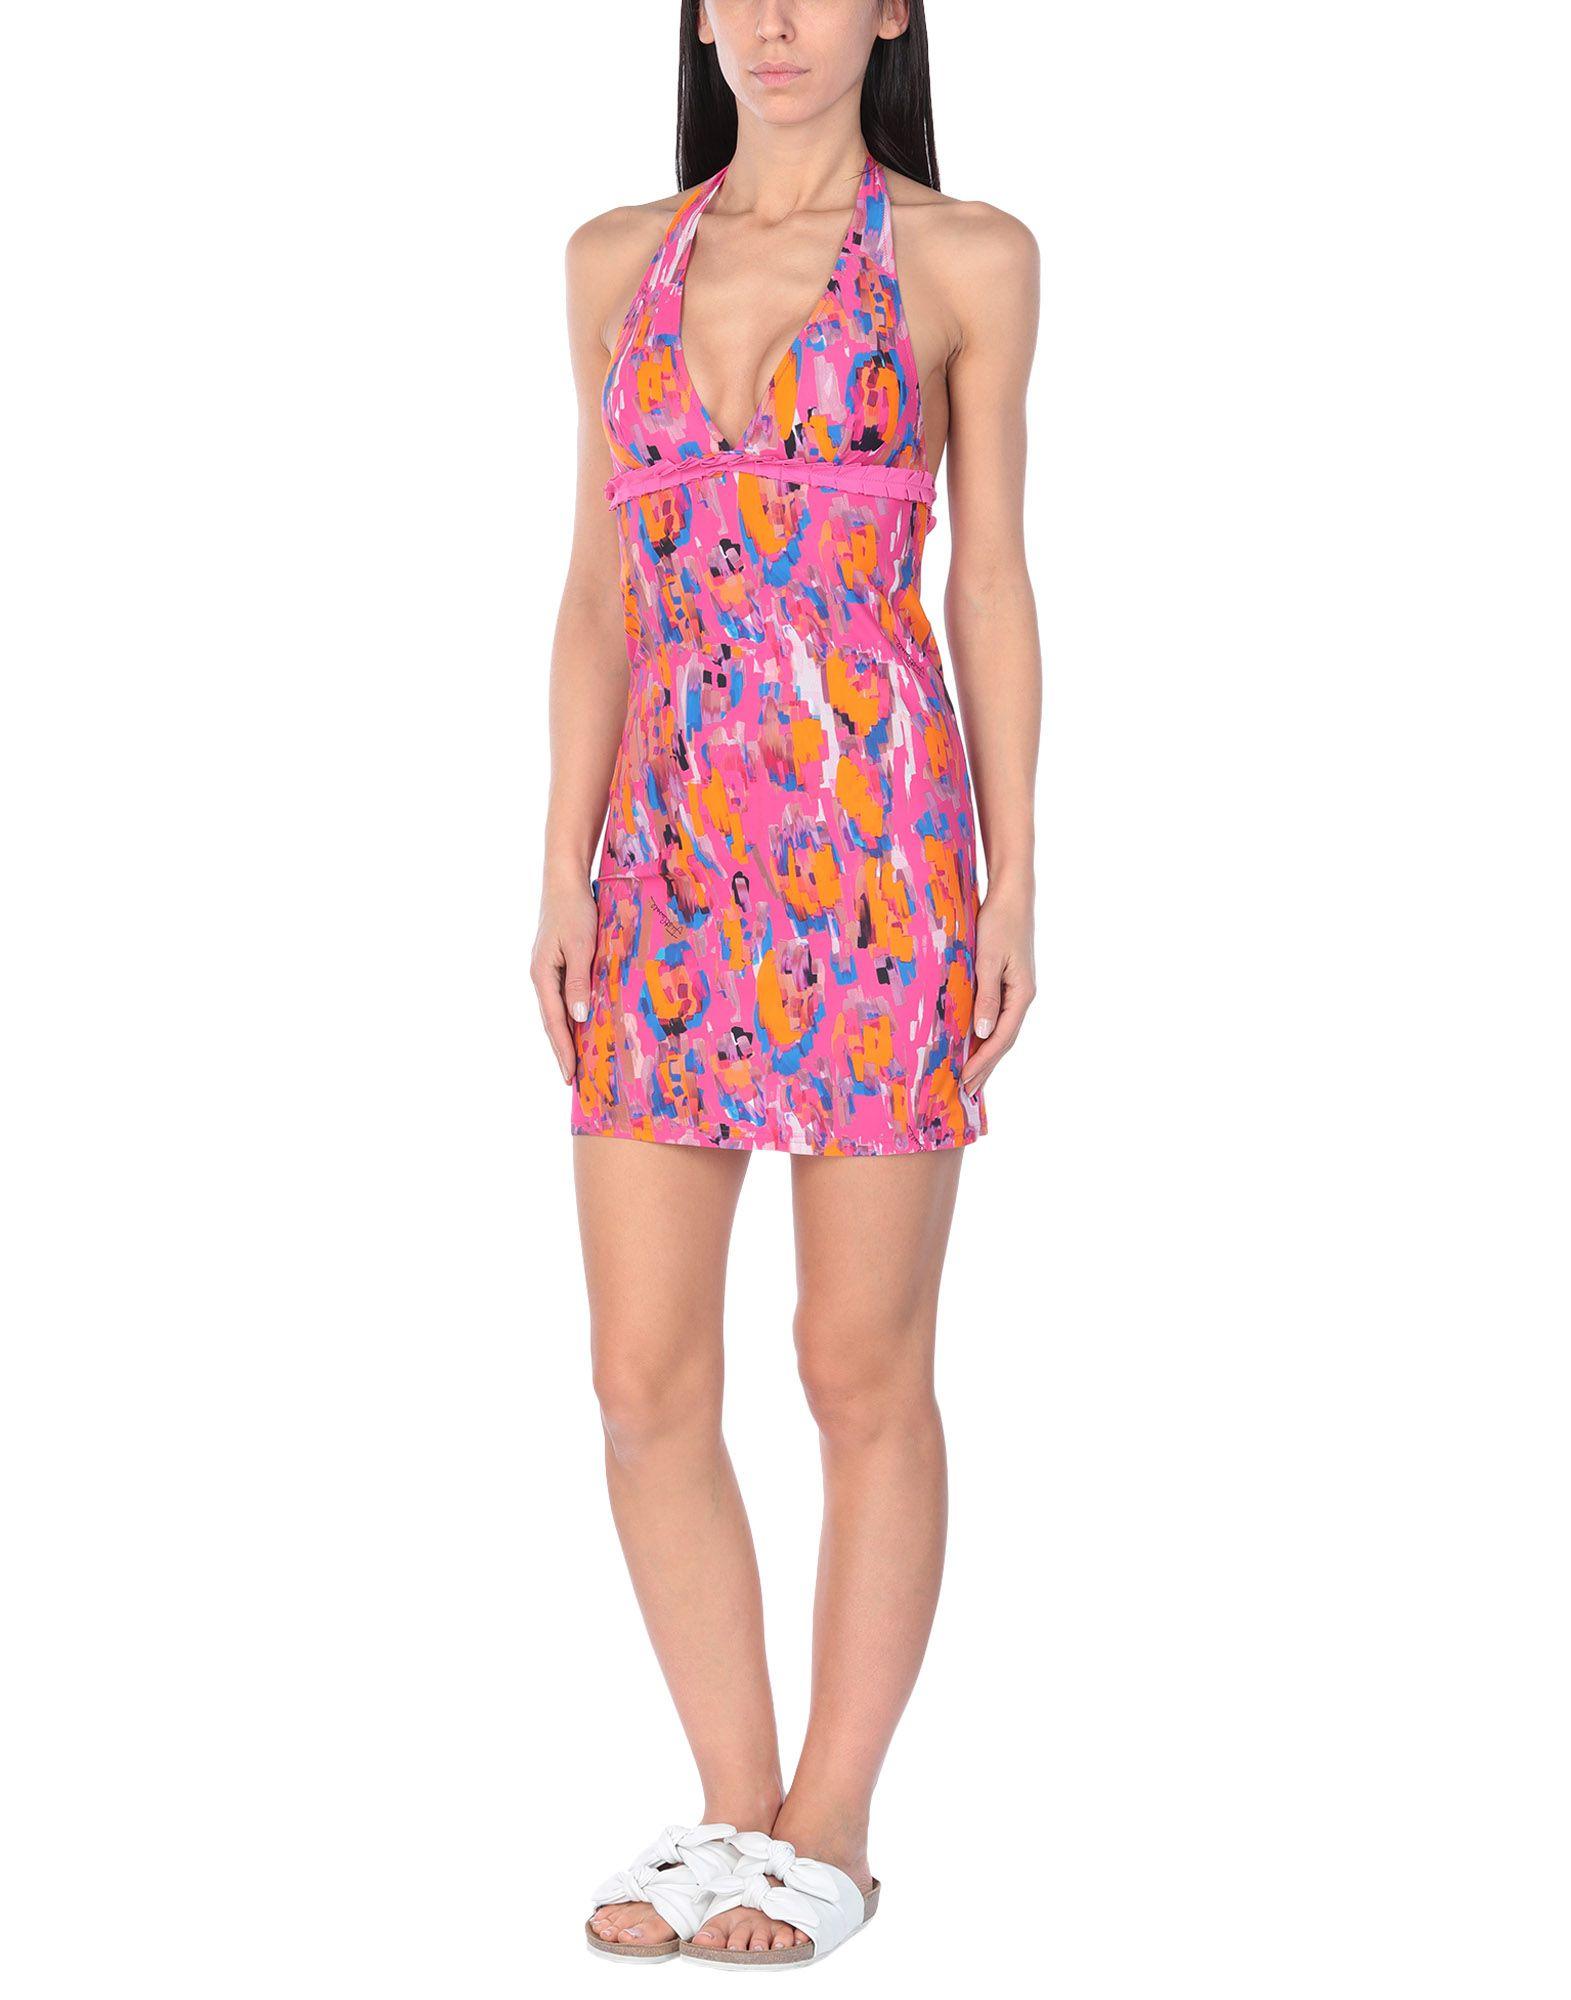 JUST CAVALLI BEACHWEAR Пляжное платье just cavalli beachwear бикини